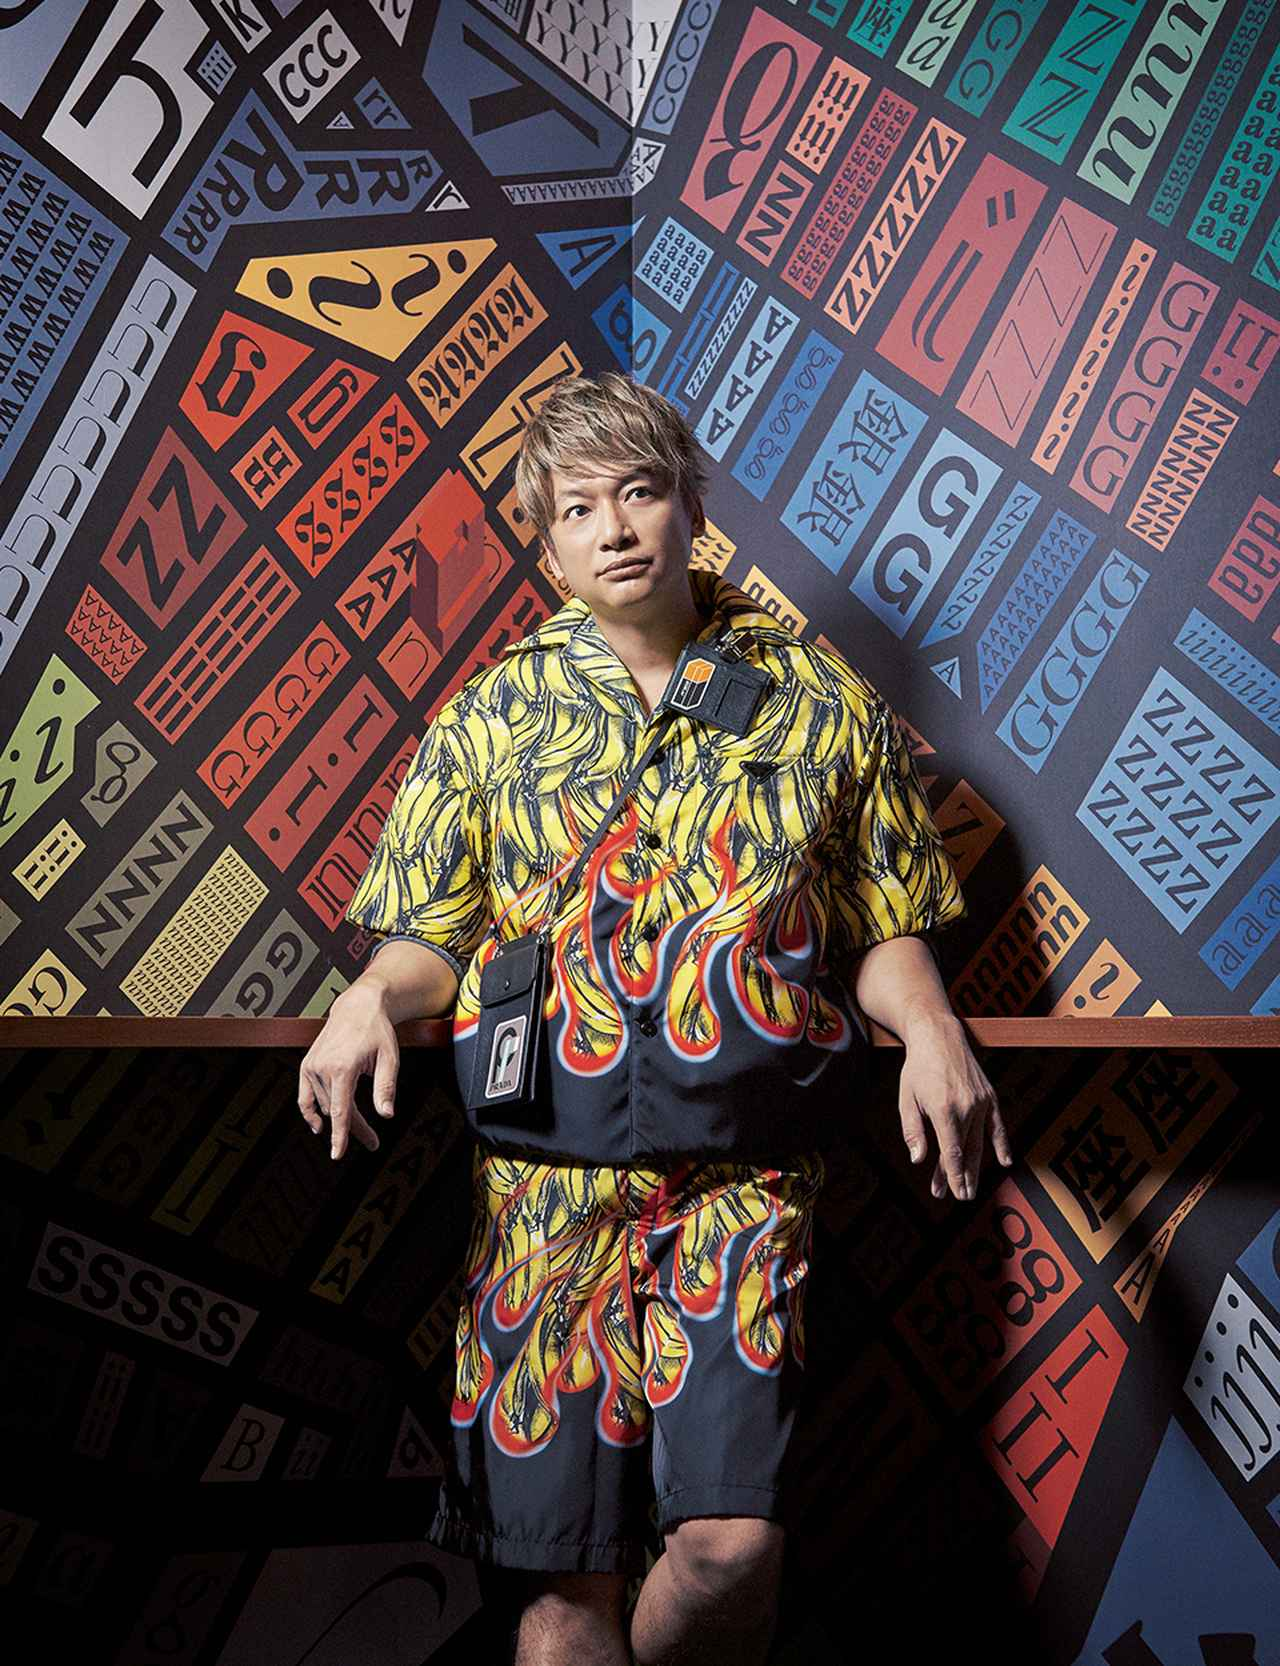 Images : 5番目の画像 - 「香取慎吾 ―― 着飾りすぎる男」のアルバム - T JAPAN:The New York Times Style Magazine 公式サイト